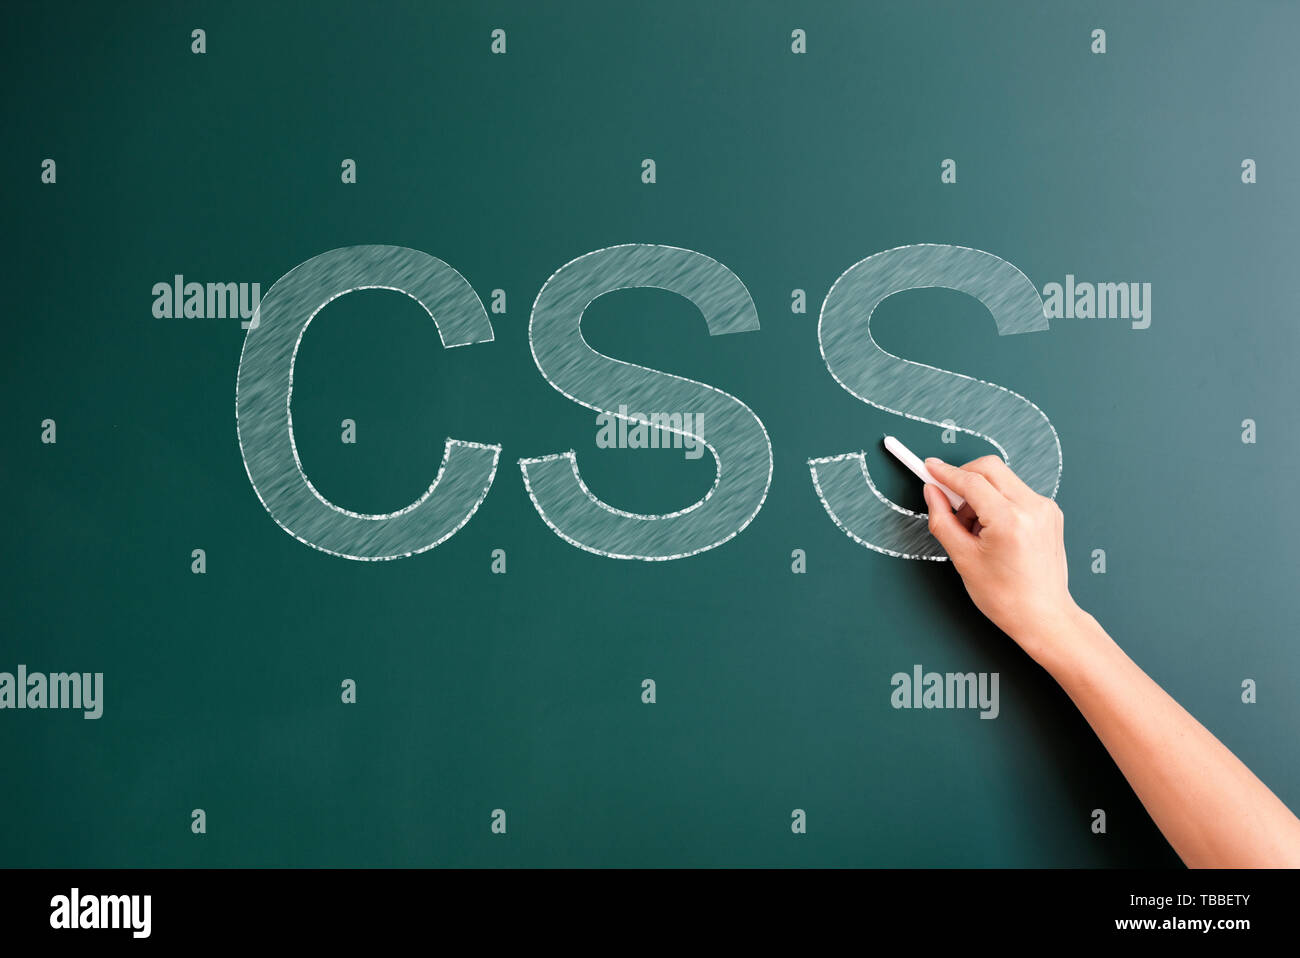 css written on blackboard - Stock Image